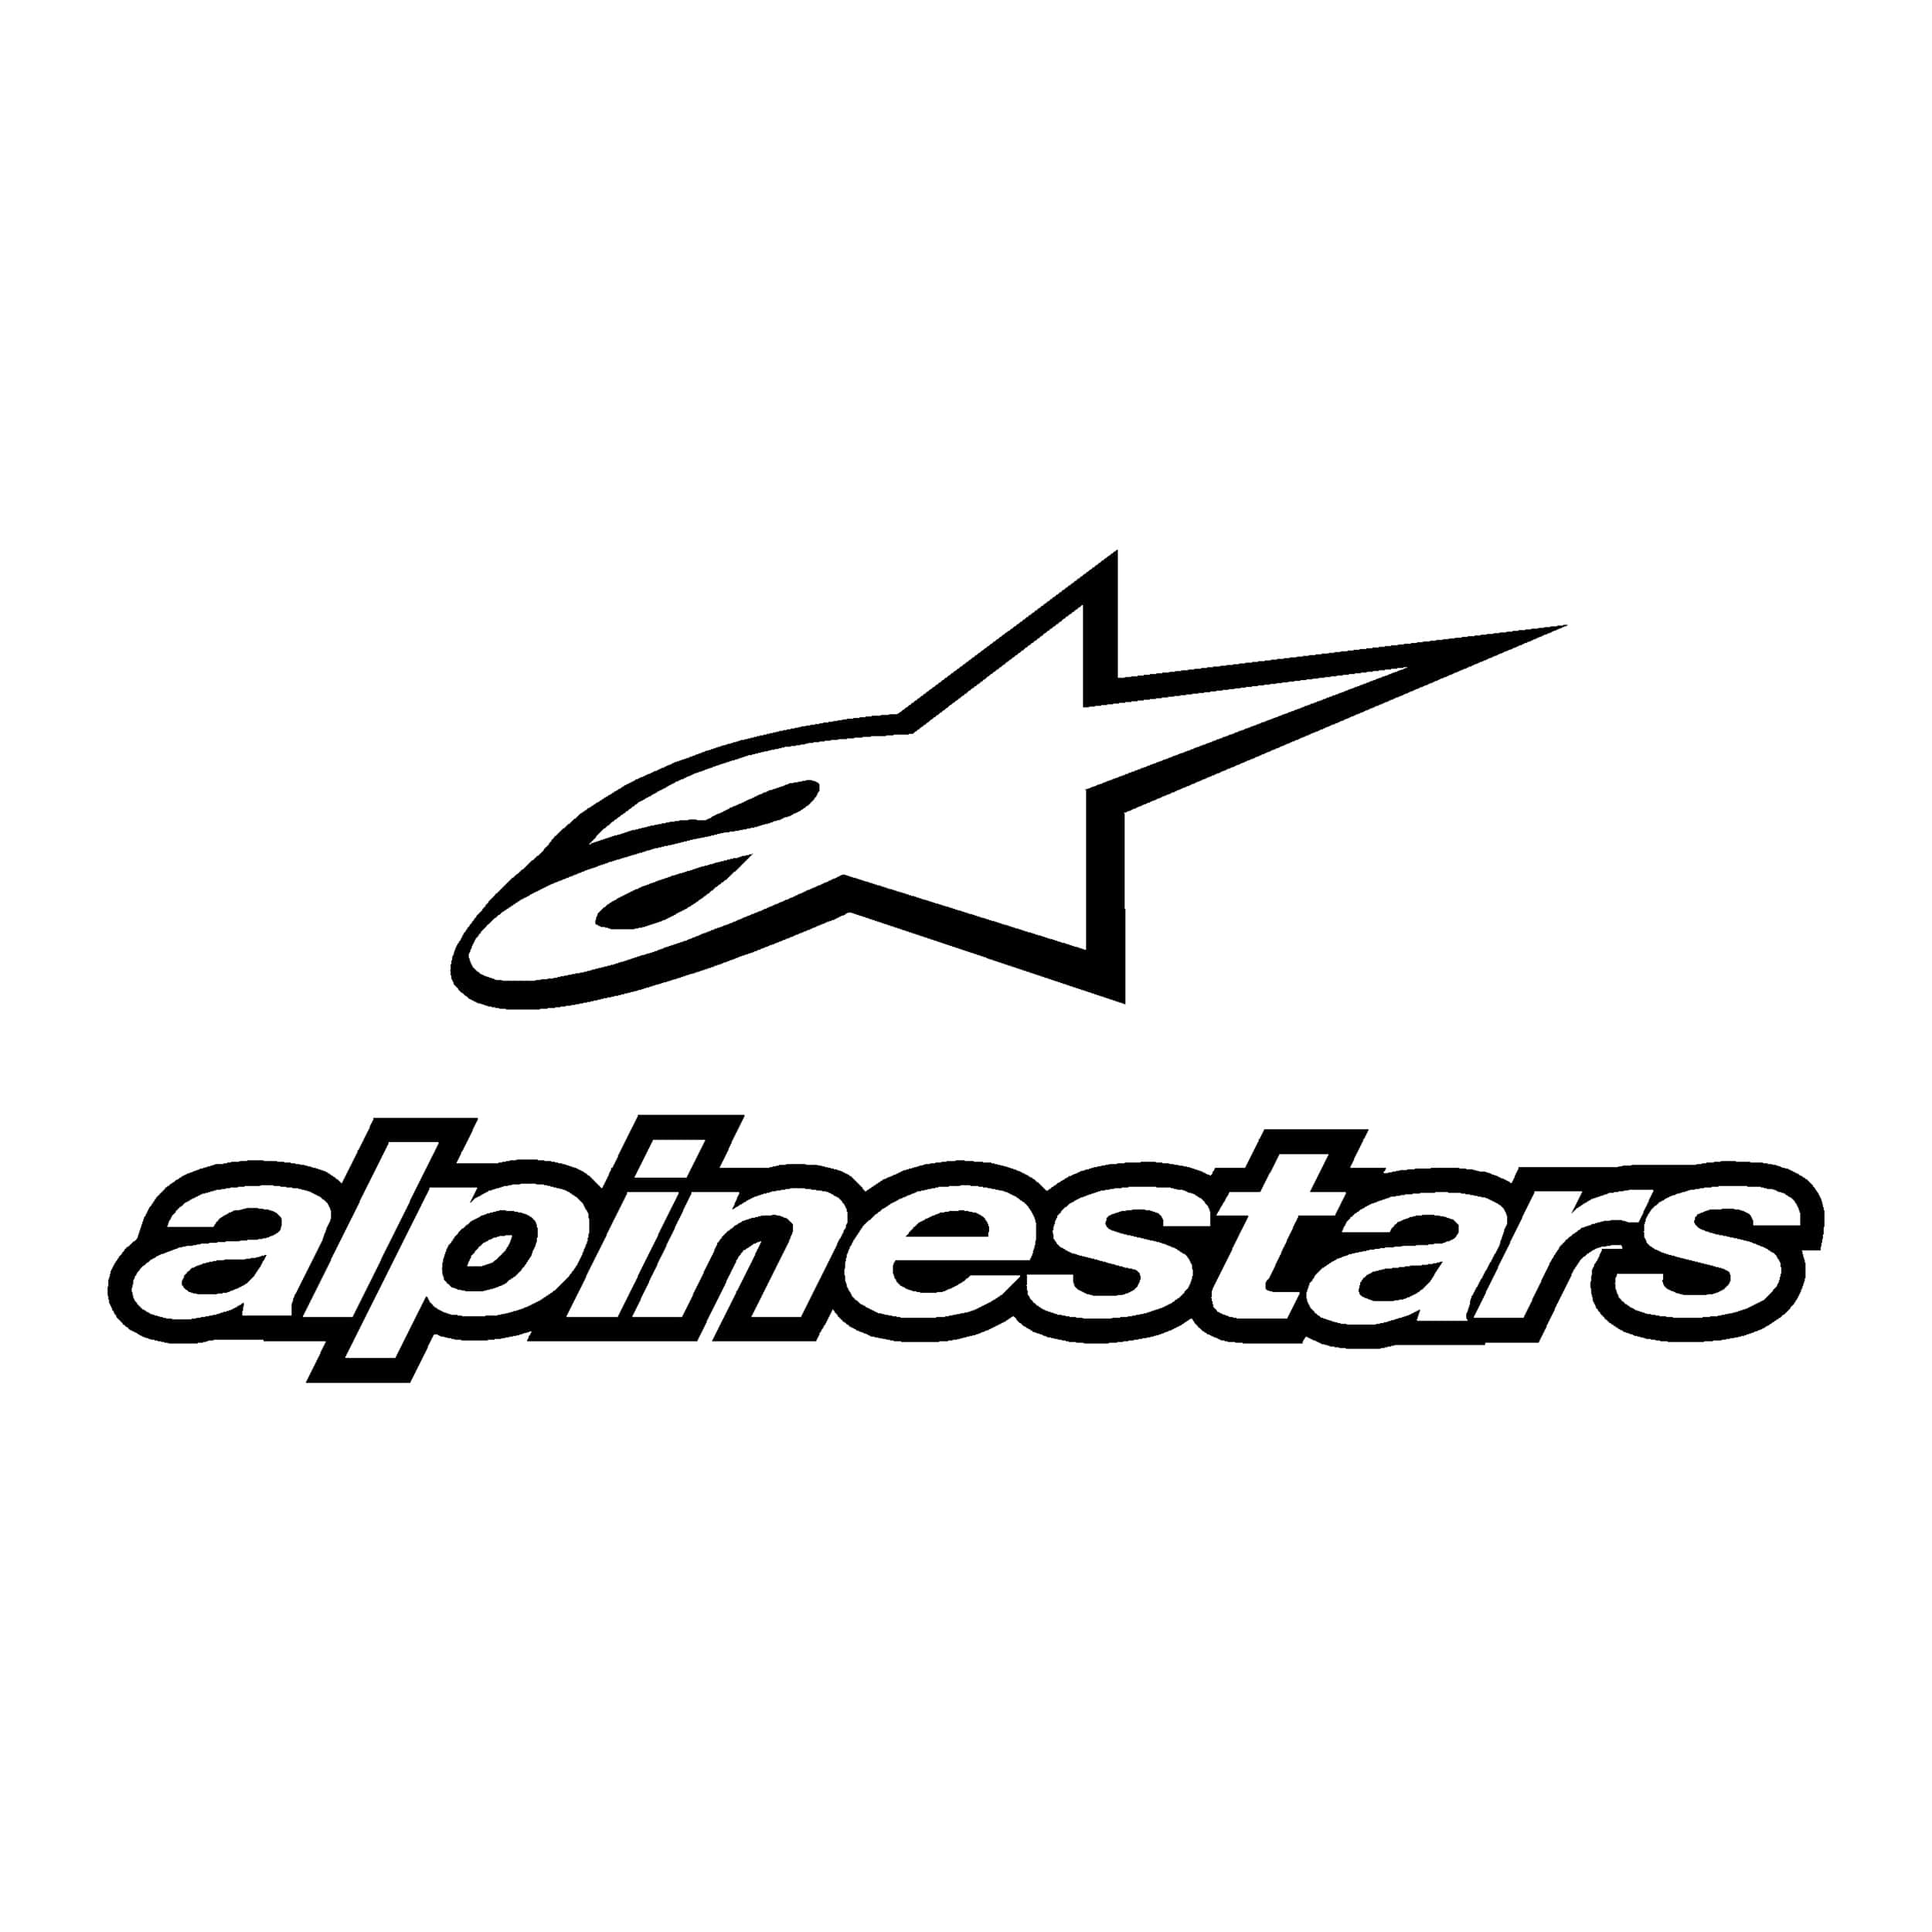 Alpinestars Decal Alpine Star camion